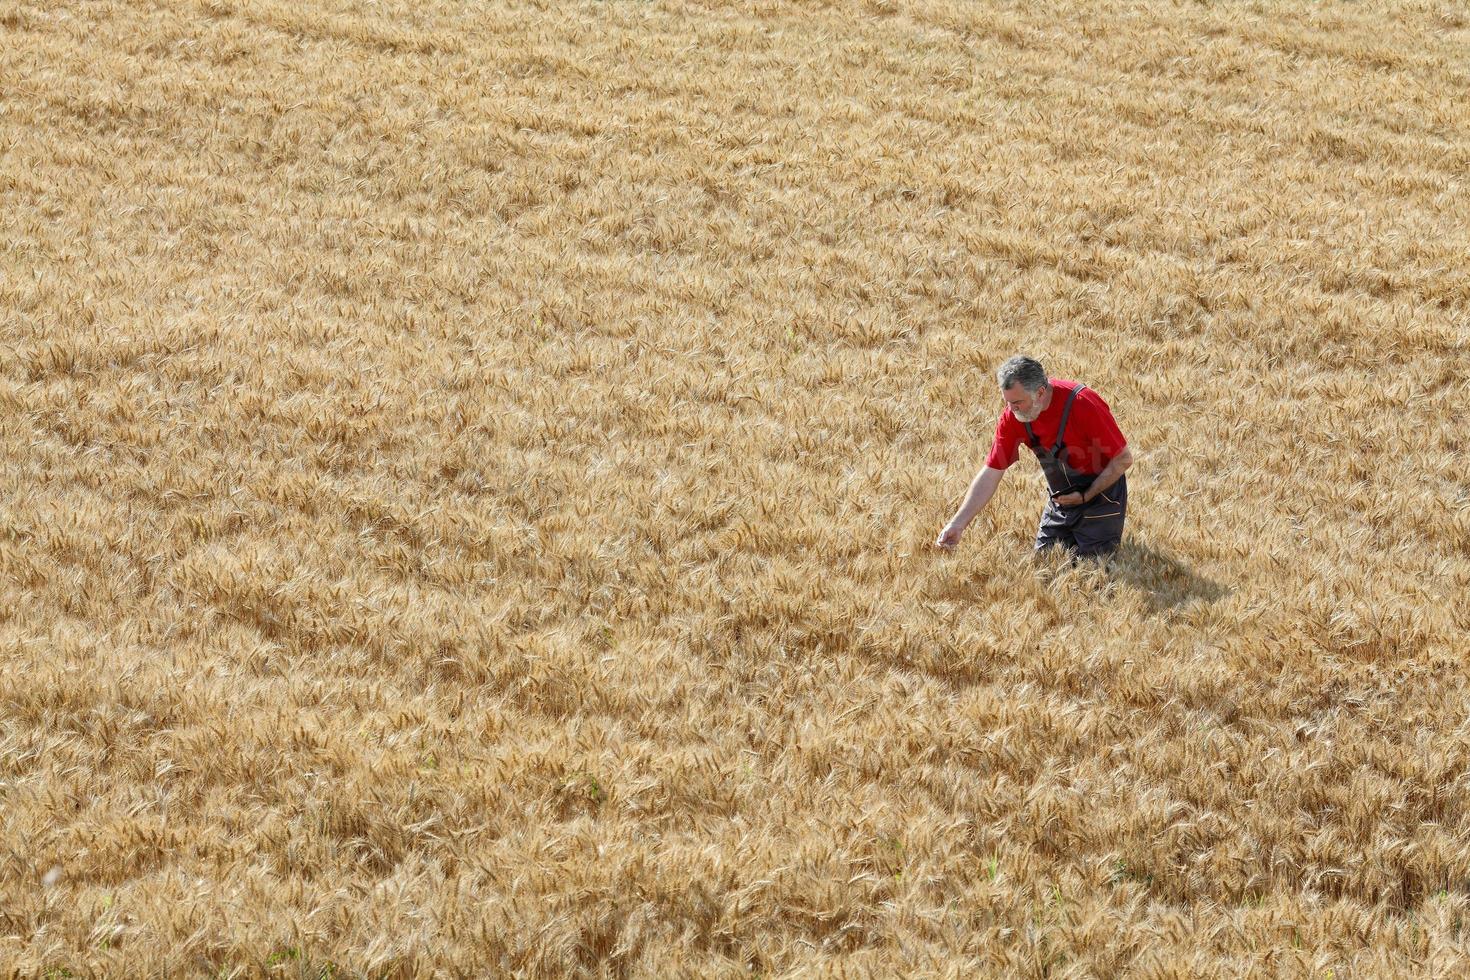 Landwirtschaftsszene, Landwirt oder Agronom inspizieren Weizenfeld foto